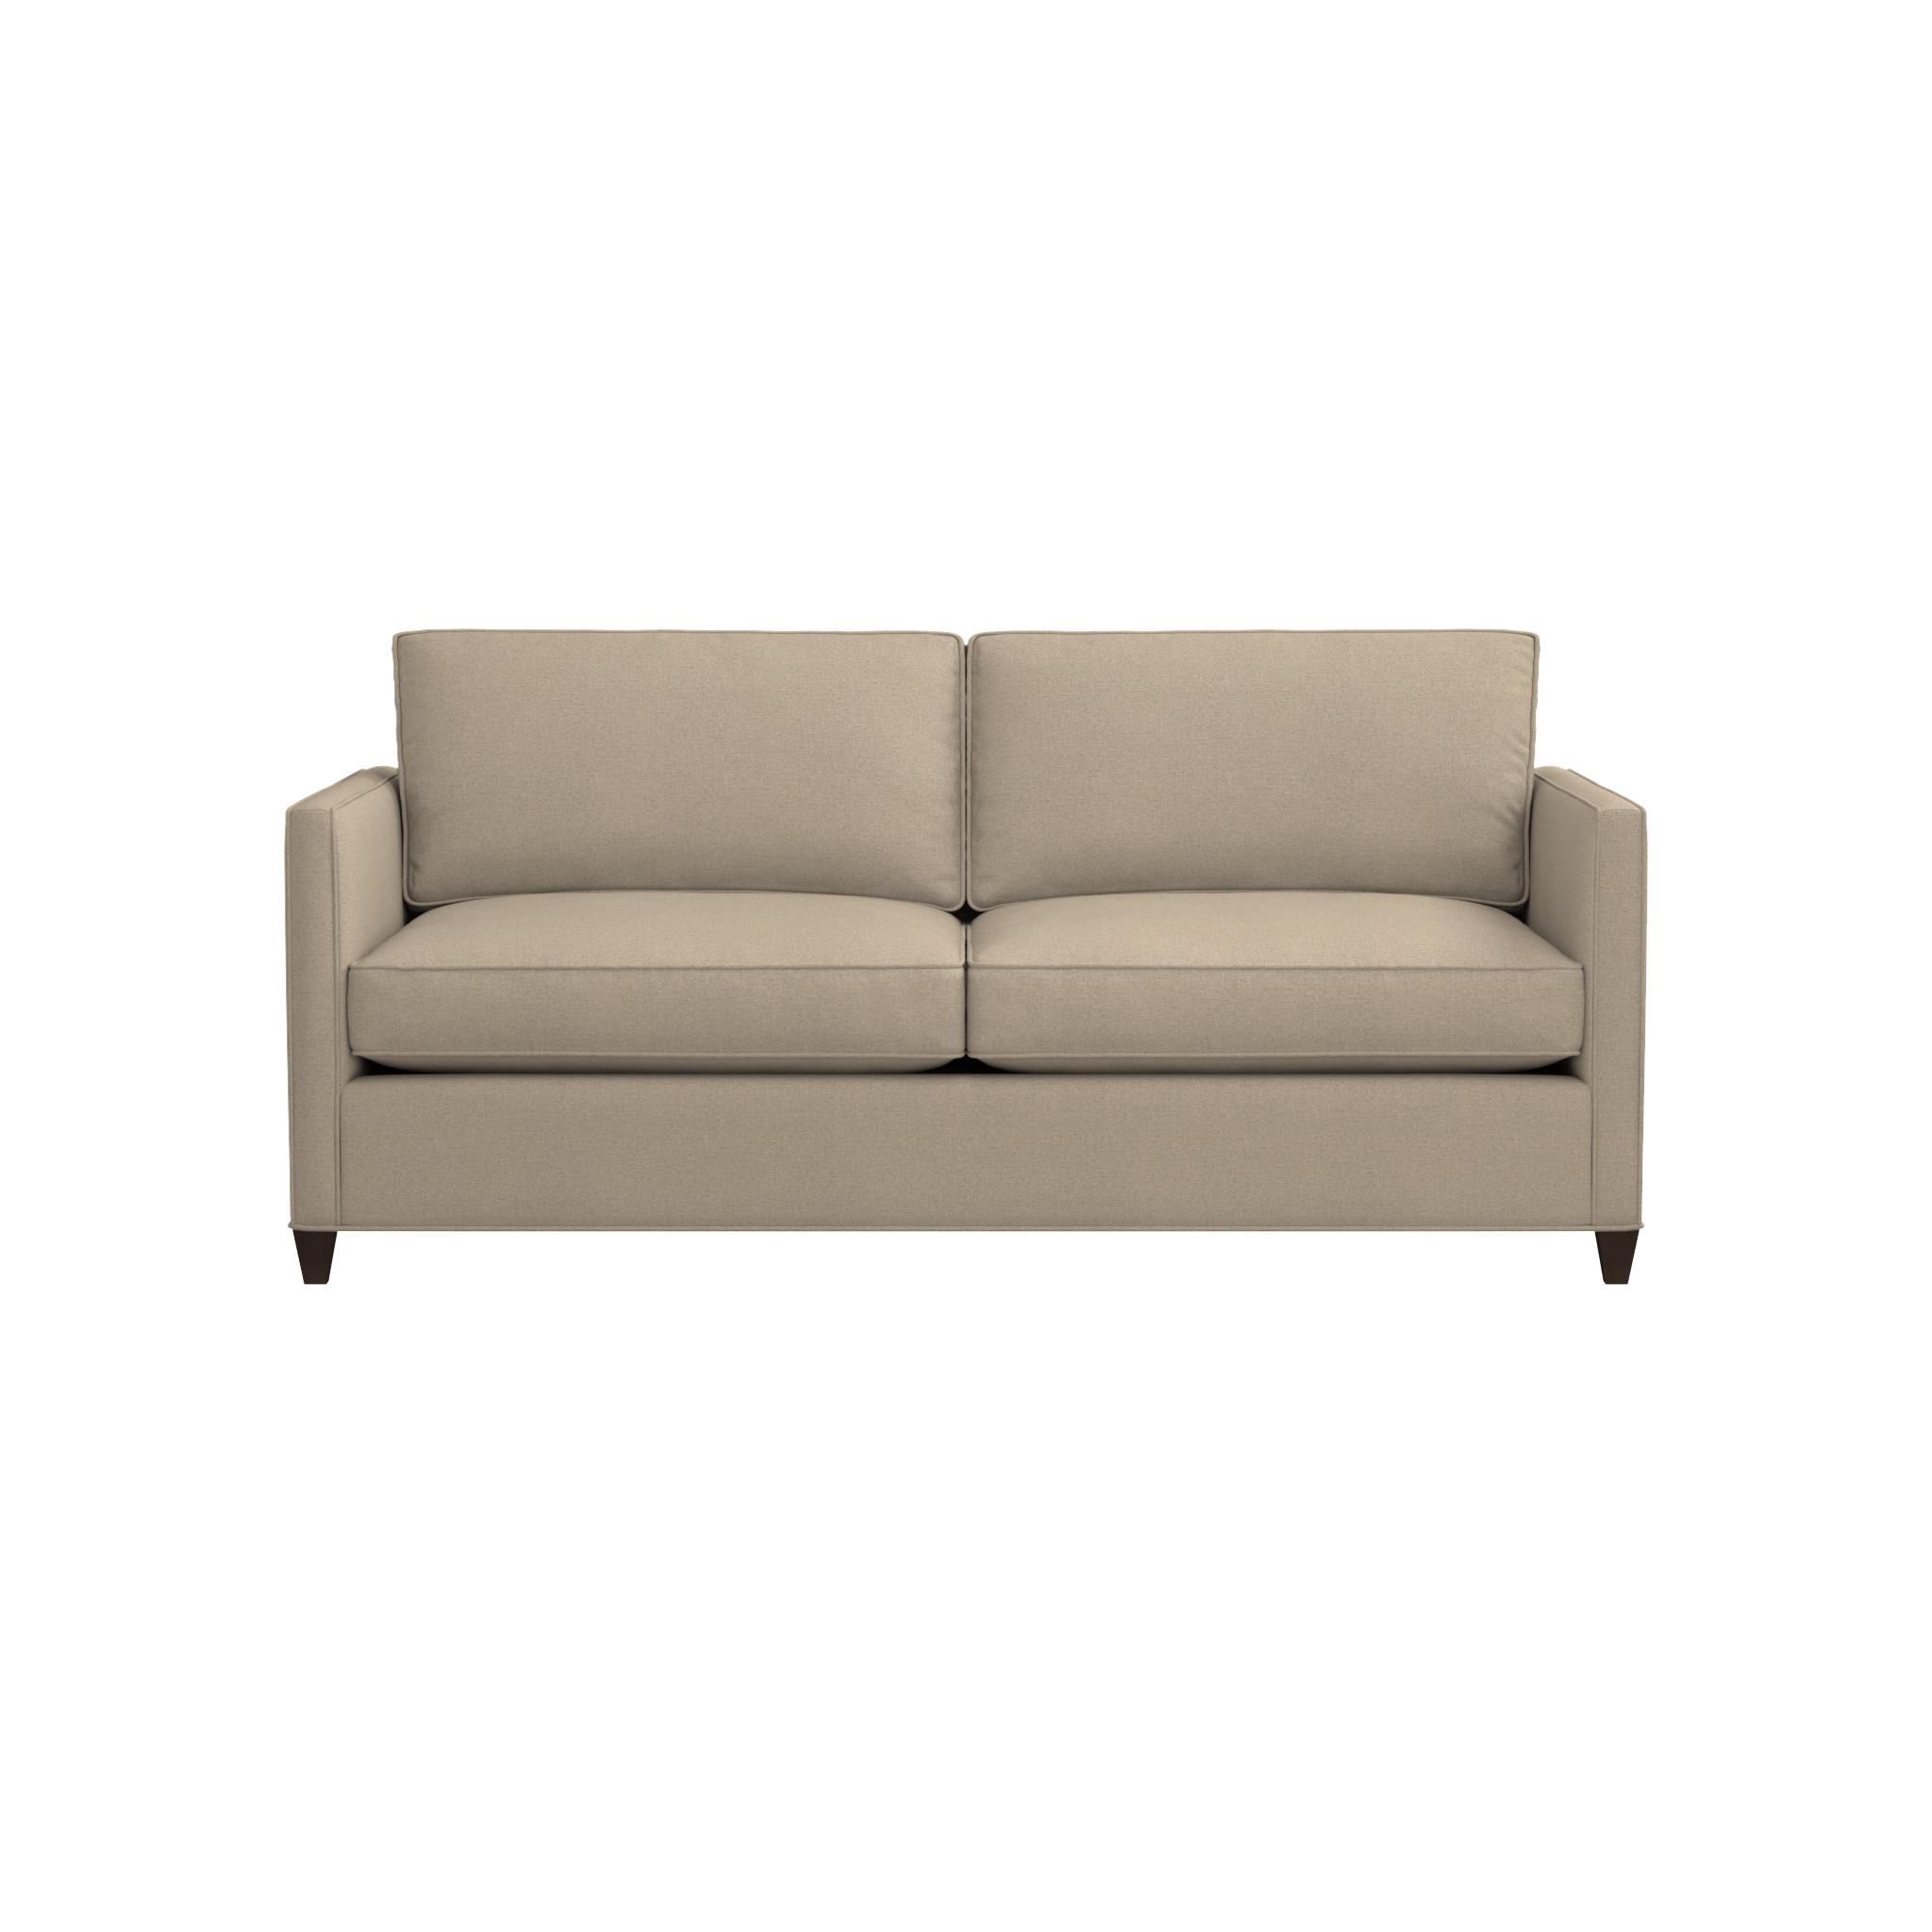 dryden apartment sofa pinterest classic definition nailhead rh pinterest co uk Best Sleeper Sofa Best Sleeper Sofa